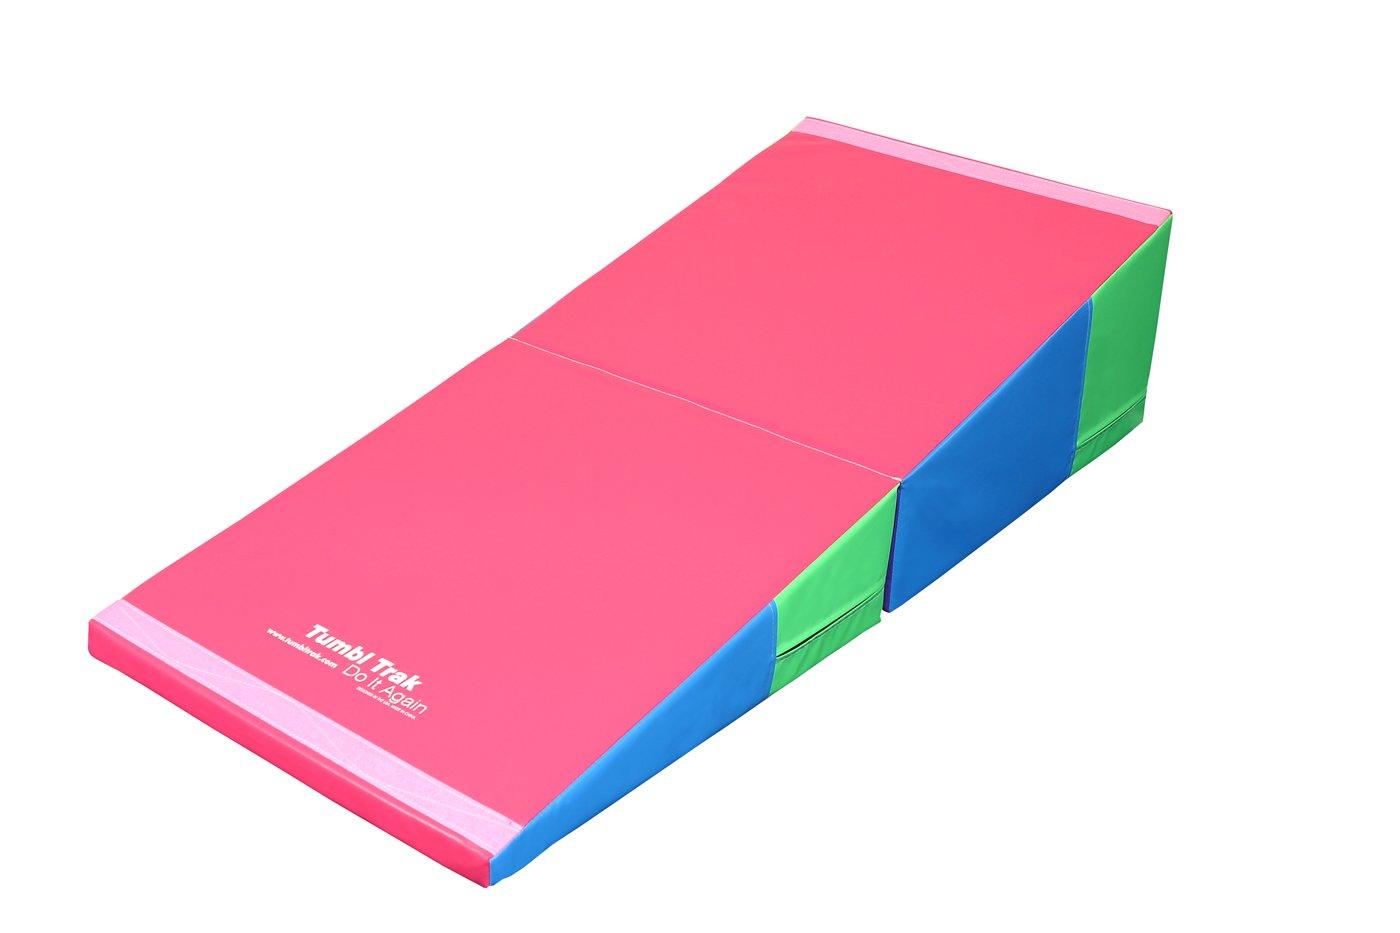 we ip folding com purple mats sell walmart gymnastics mat incline pink medium